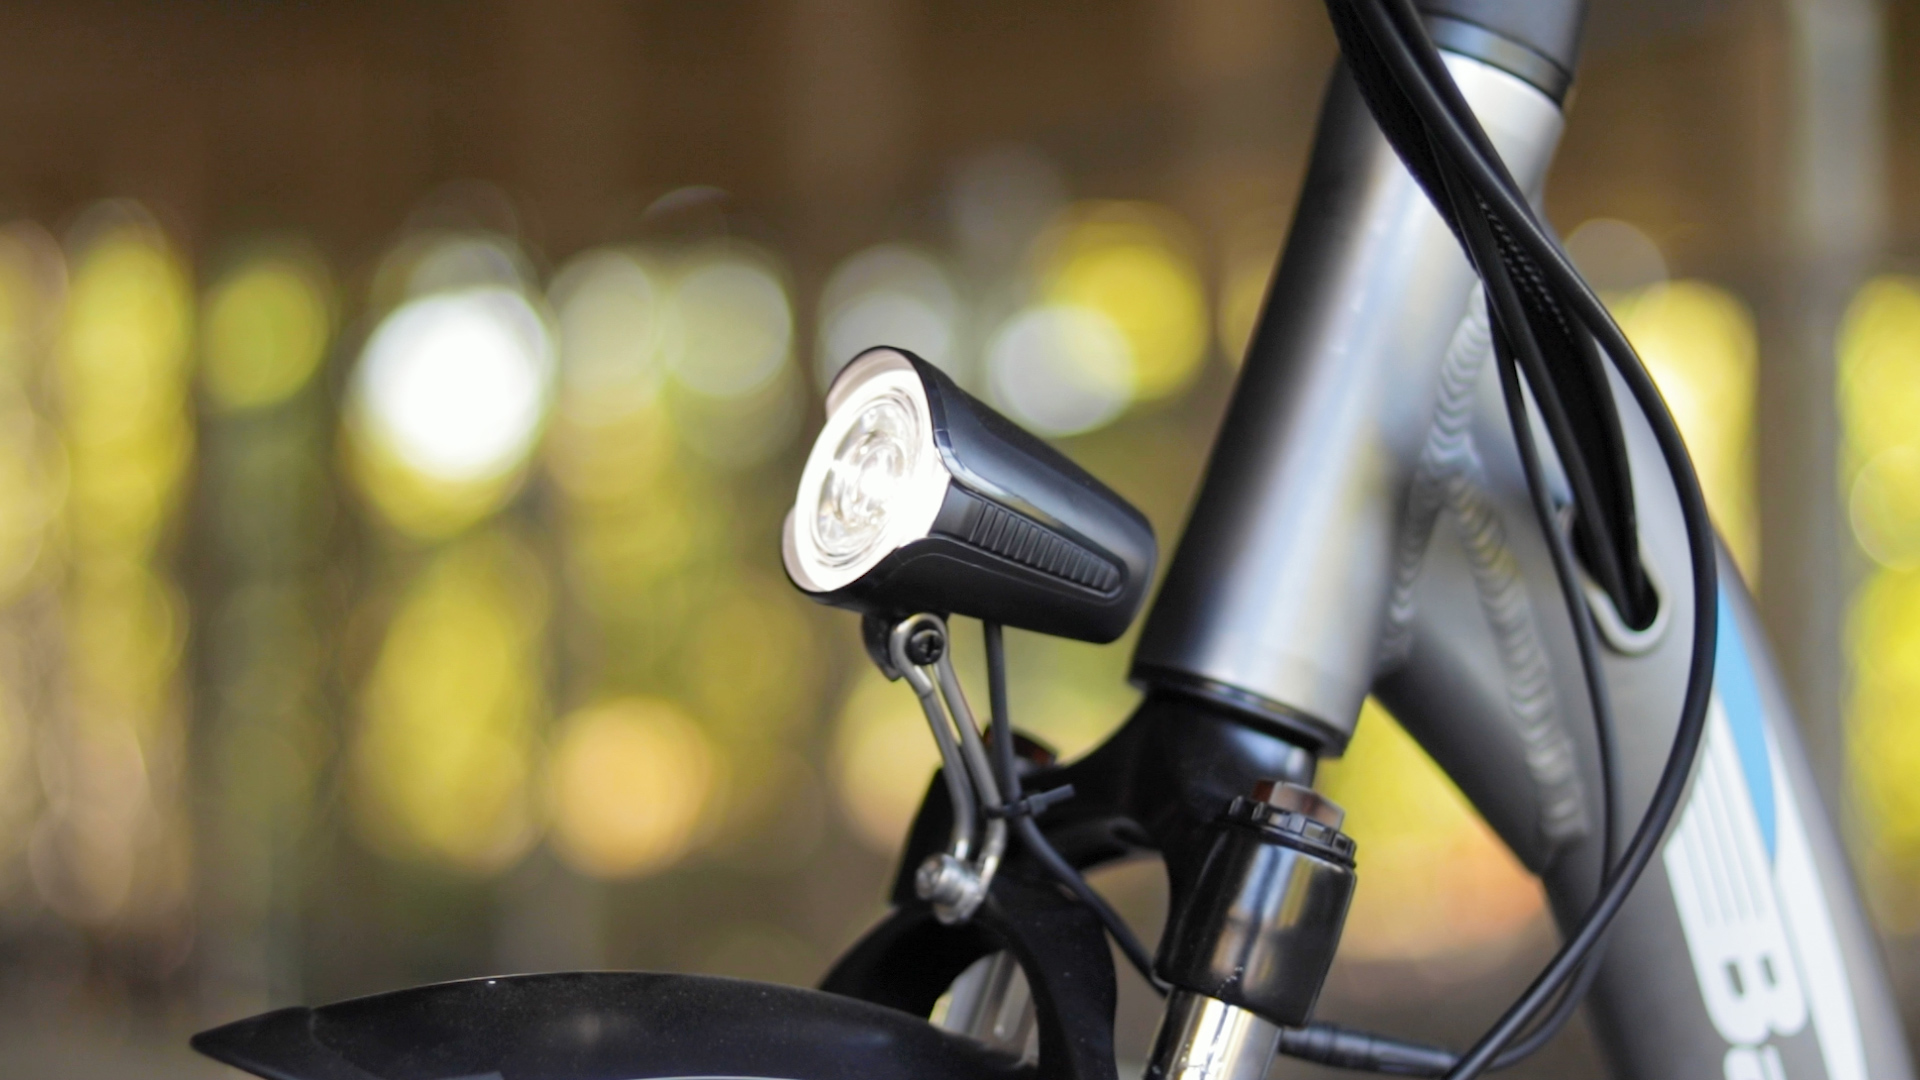 electrified-reviews-bagibike-b10-foldign-electric-bike-review-light.jpg